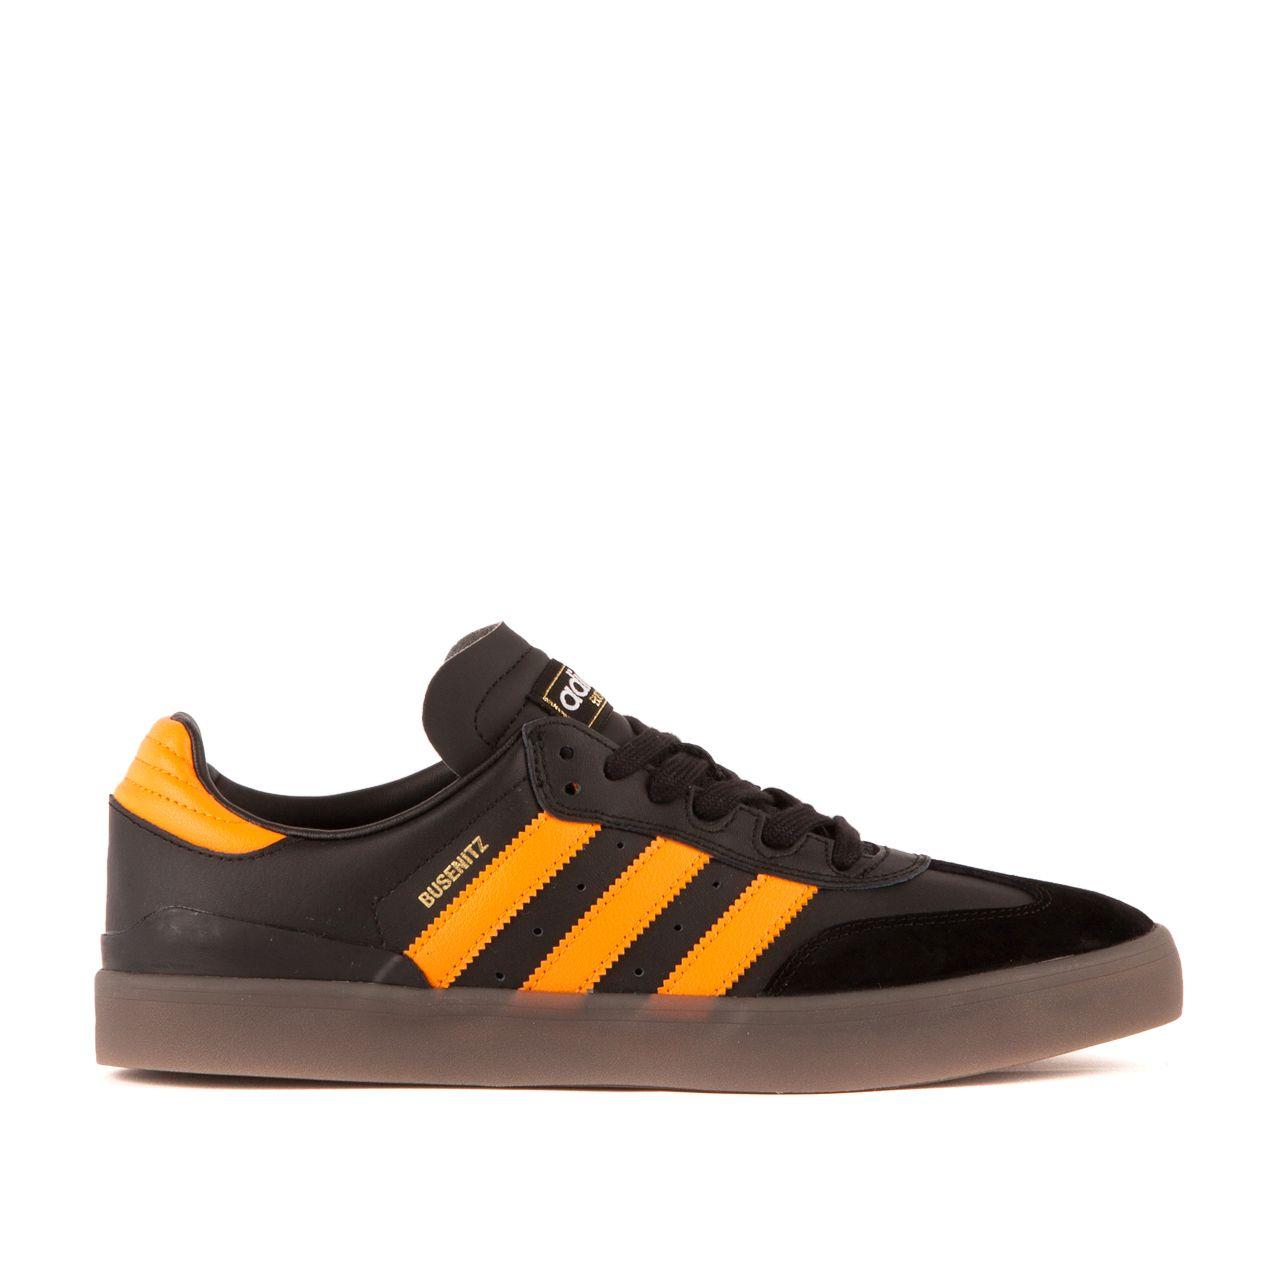 340eba0a4b0 ... Sort Rød Hvid adidas Busenitz Vulc Samba Edition (Schwarz Orange) lpu  sneaker sneakers ...